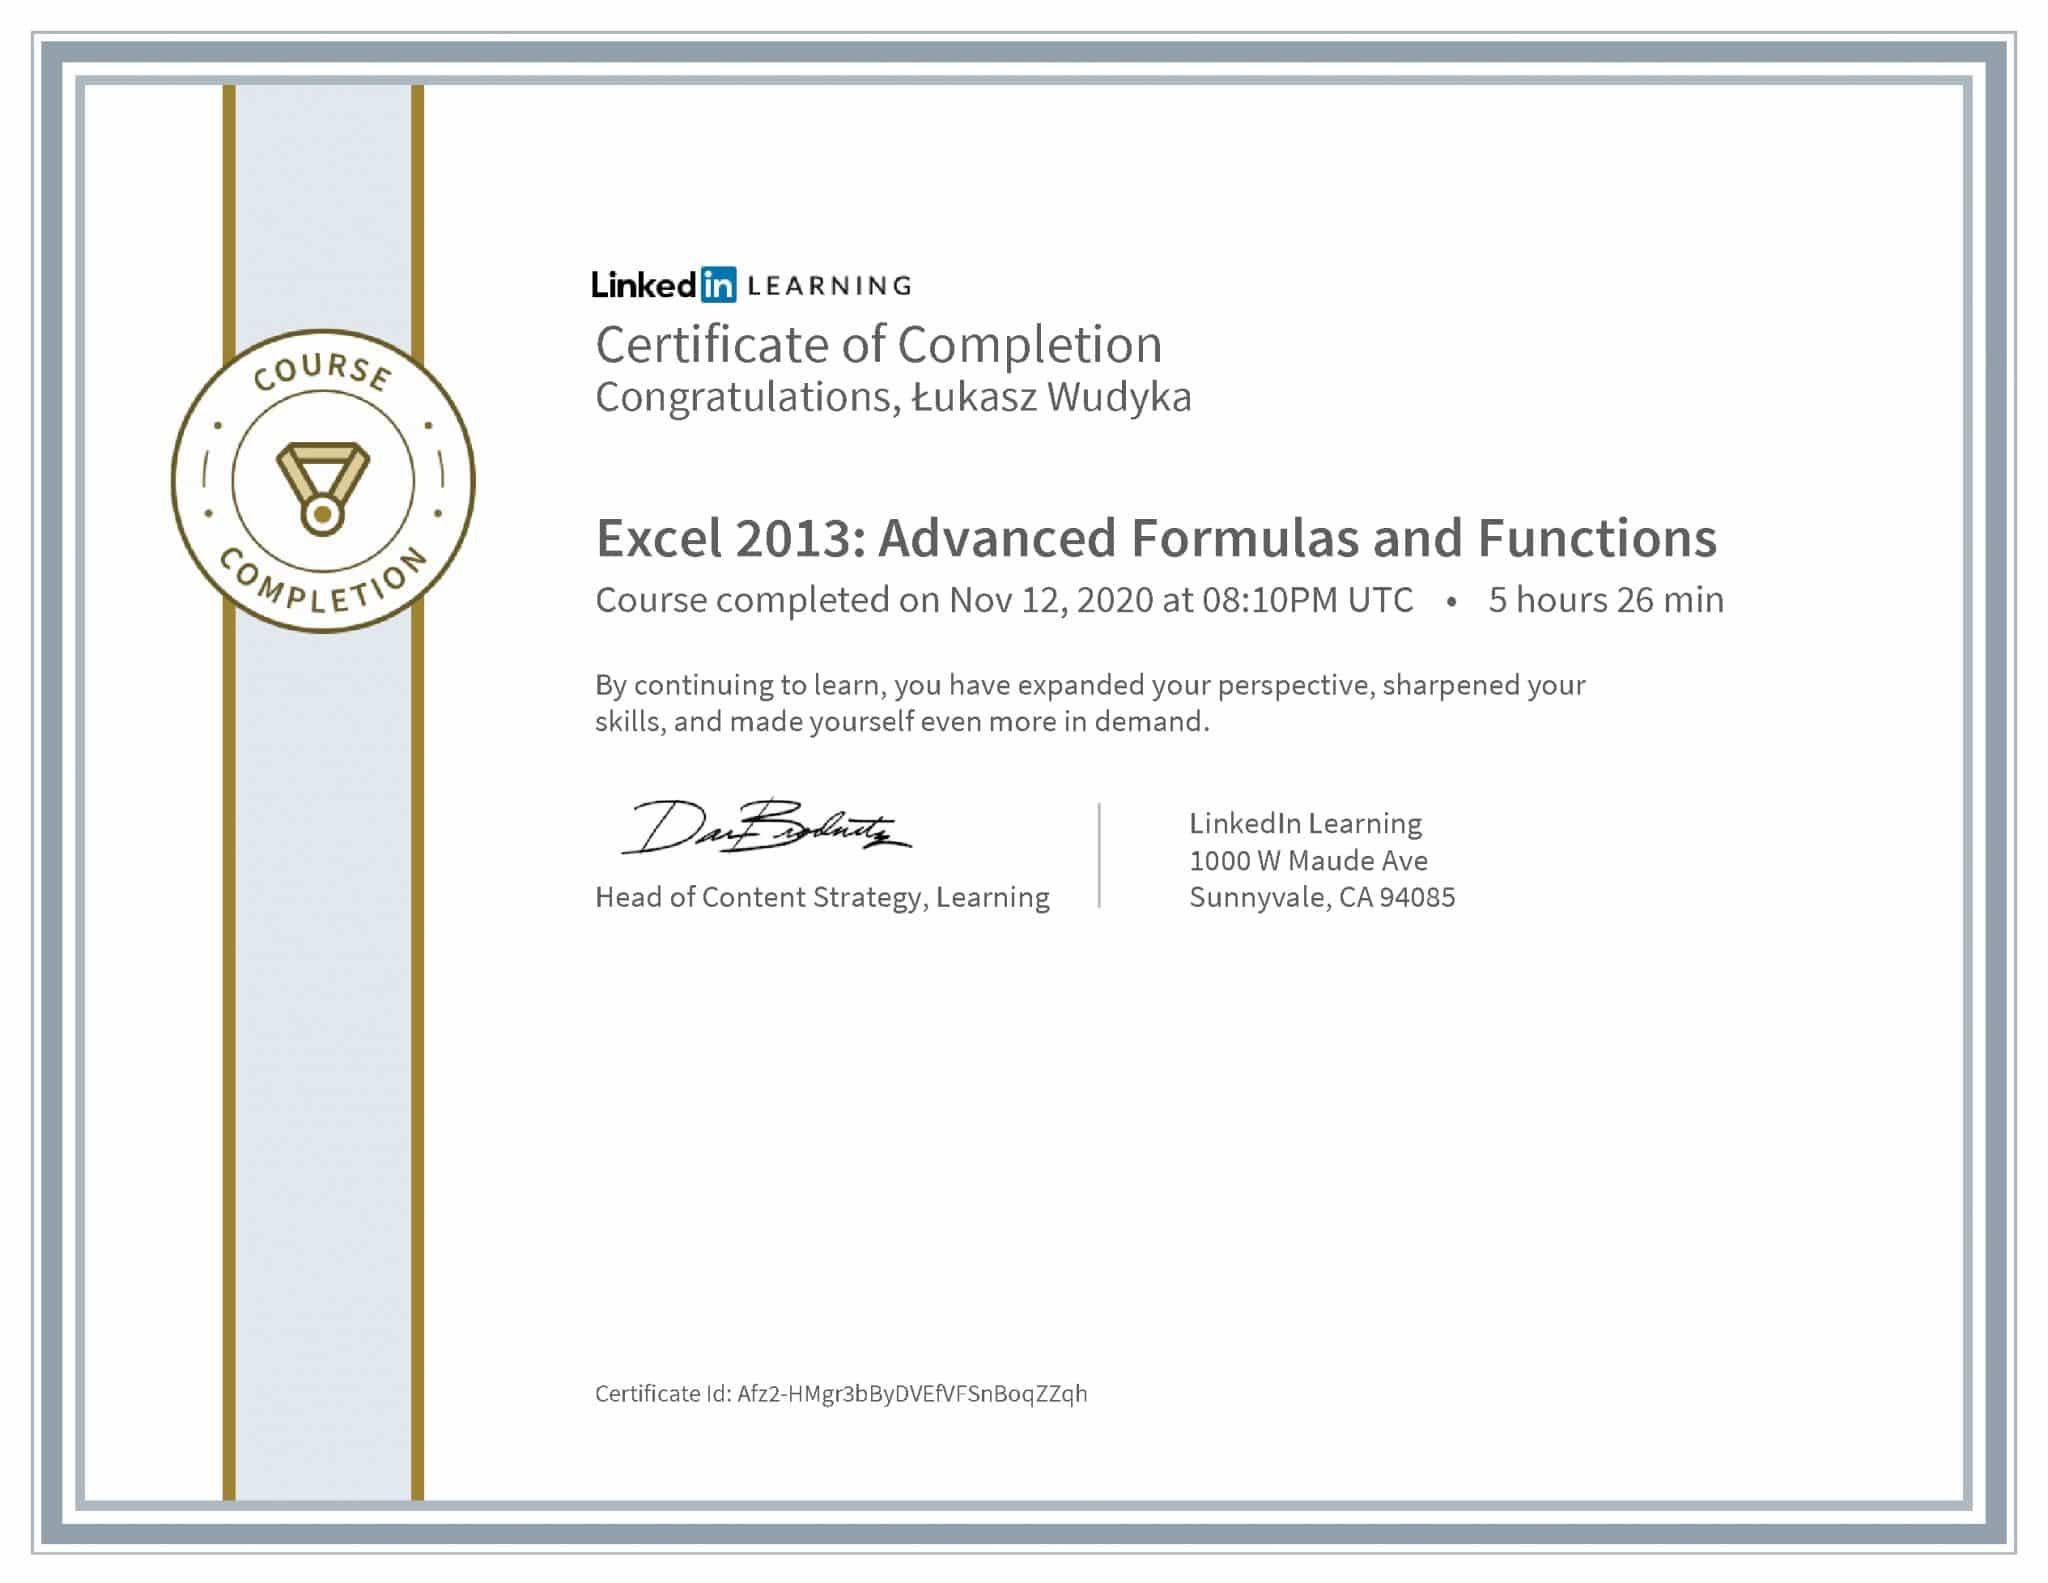 Łukasz Wudyka certyfikat LinkedIn Excel 2013: Advanced Formulas and Functions